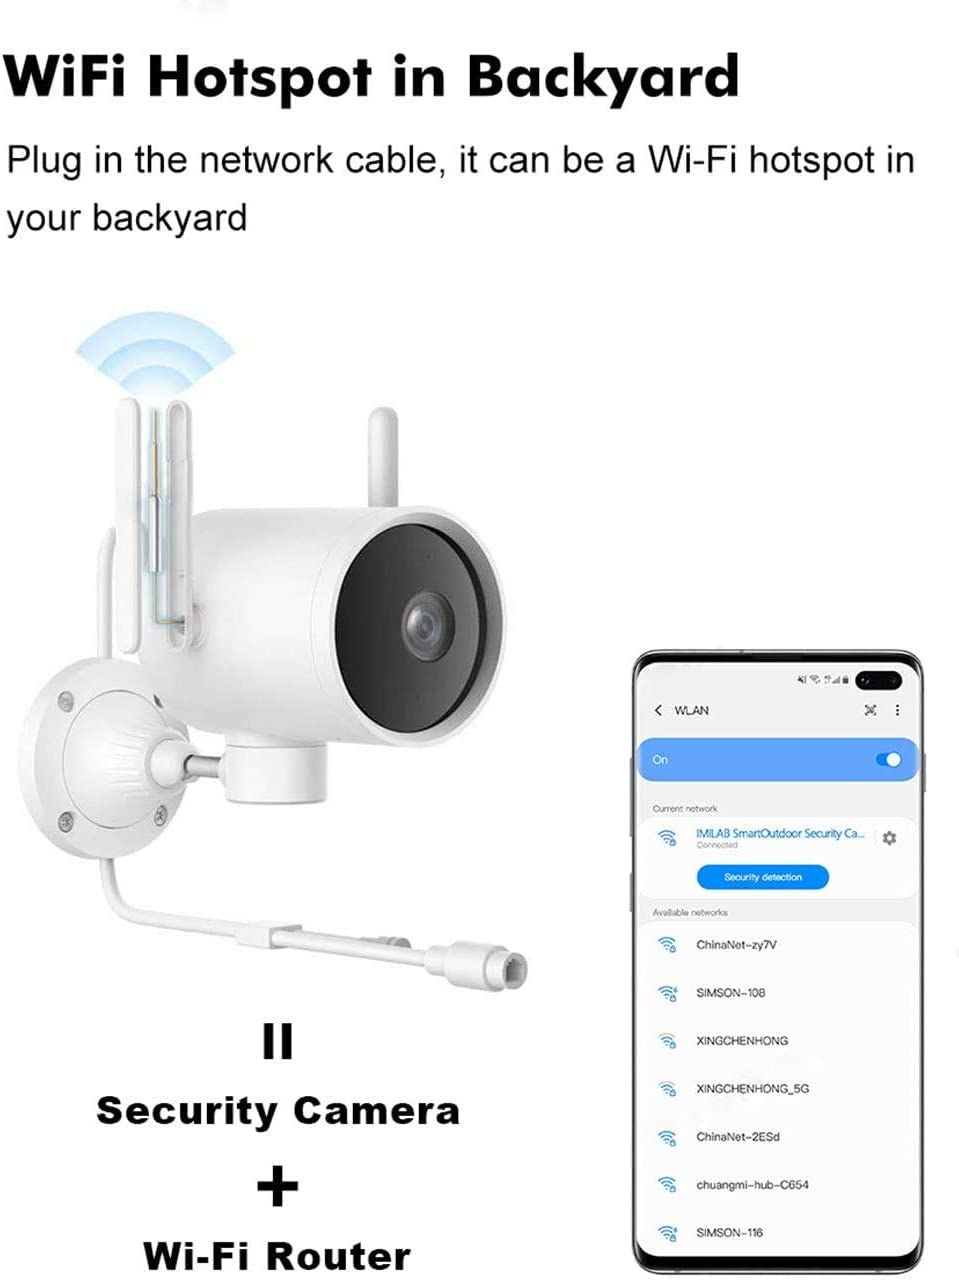 3mp Ptz Wifi Ip Camera Outdoor Imilab Ec3 1296p Hd Wifi Surveillance Camera With Two Way Audio Night Vision Motion Detection Activity Alarm Deterrent Alarm Baumarkt